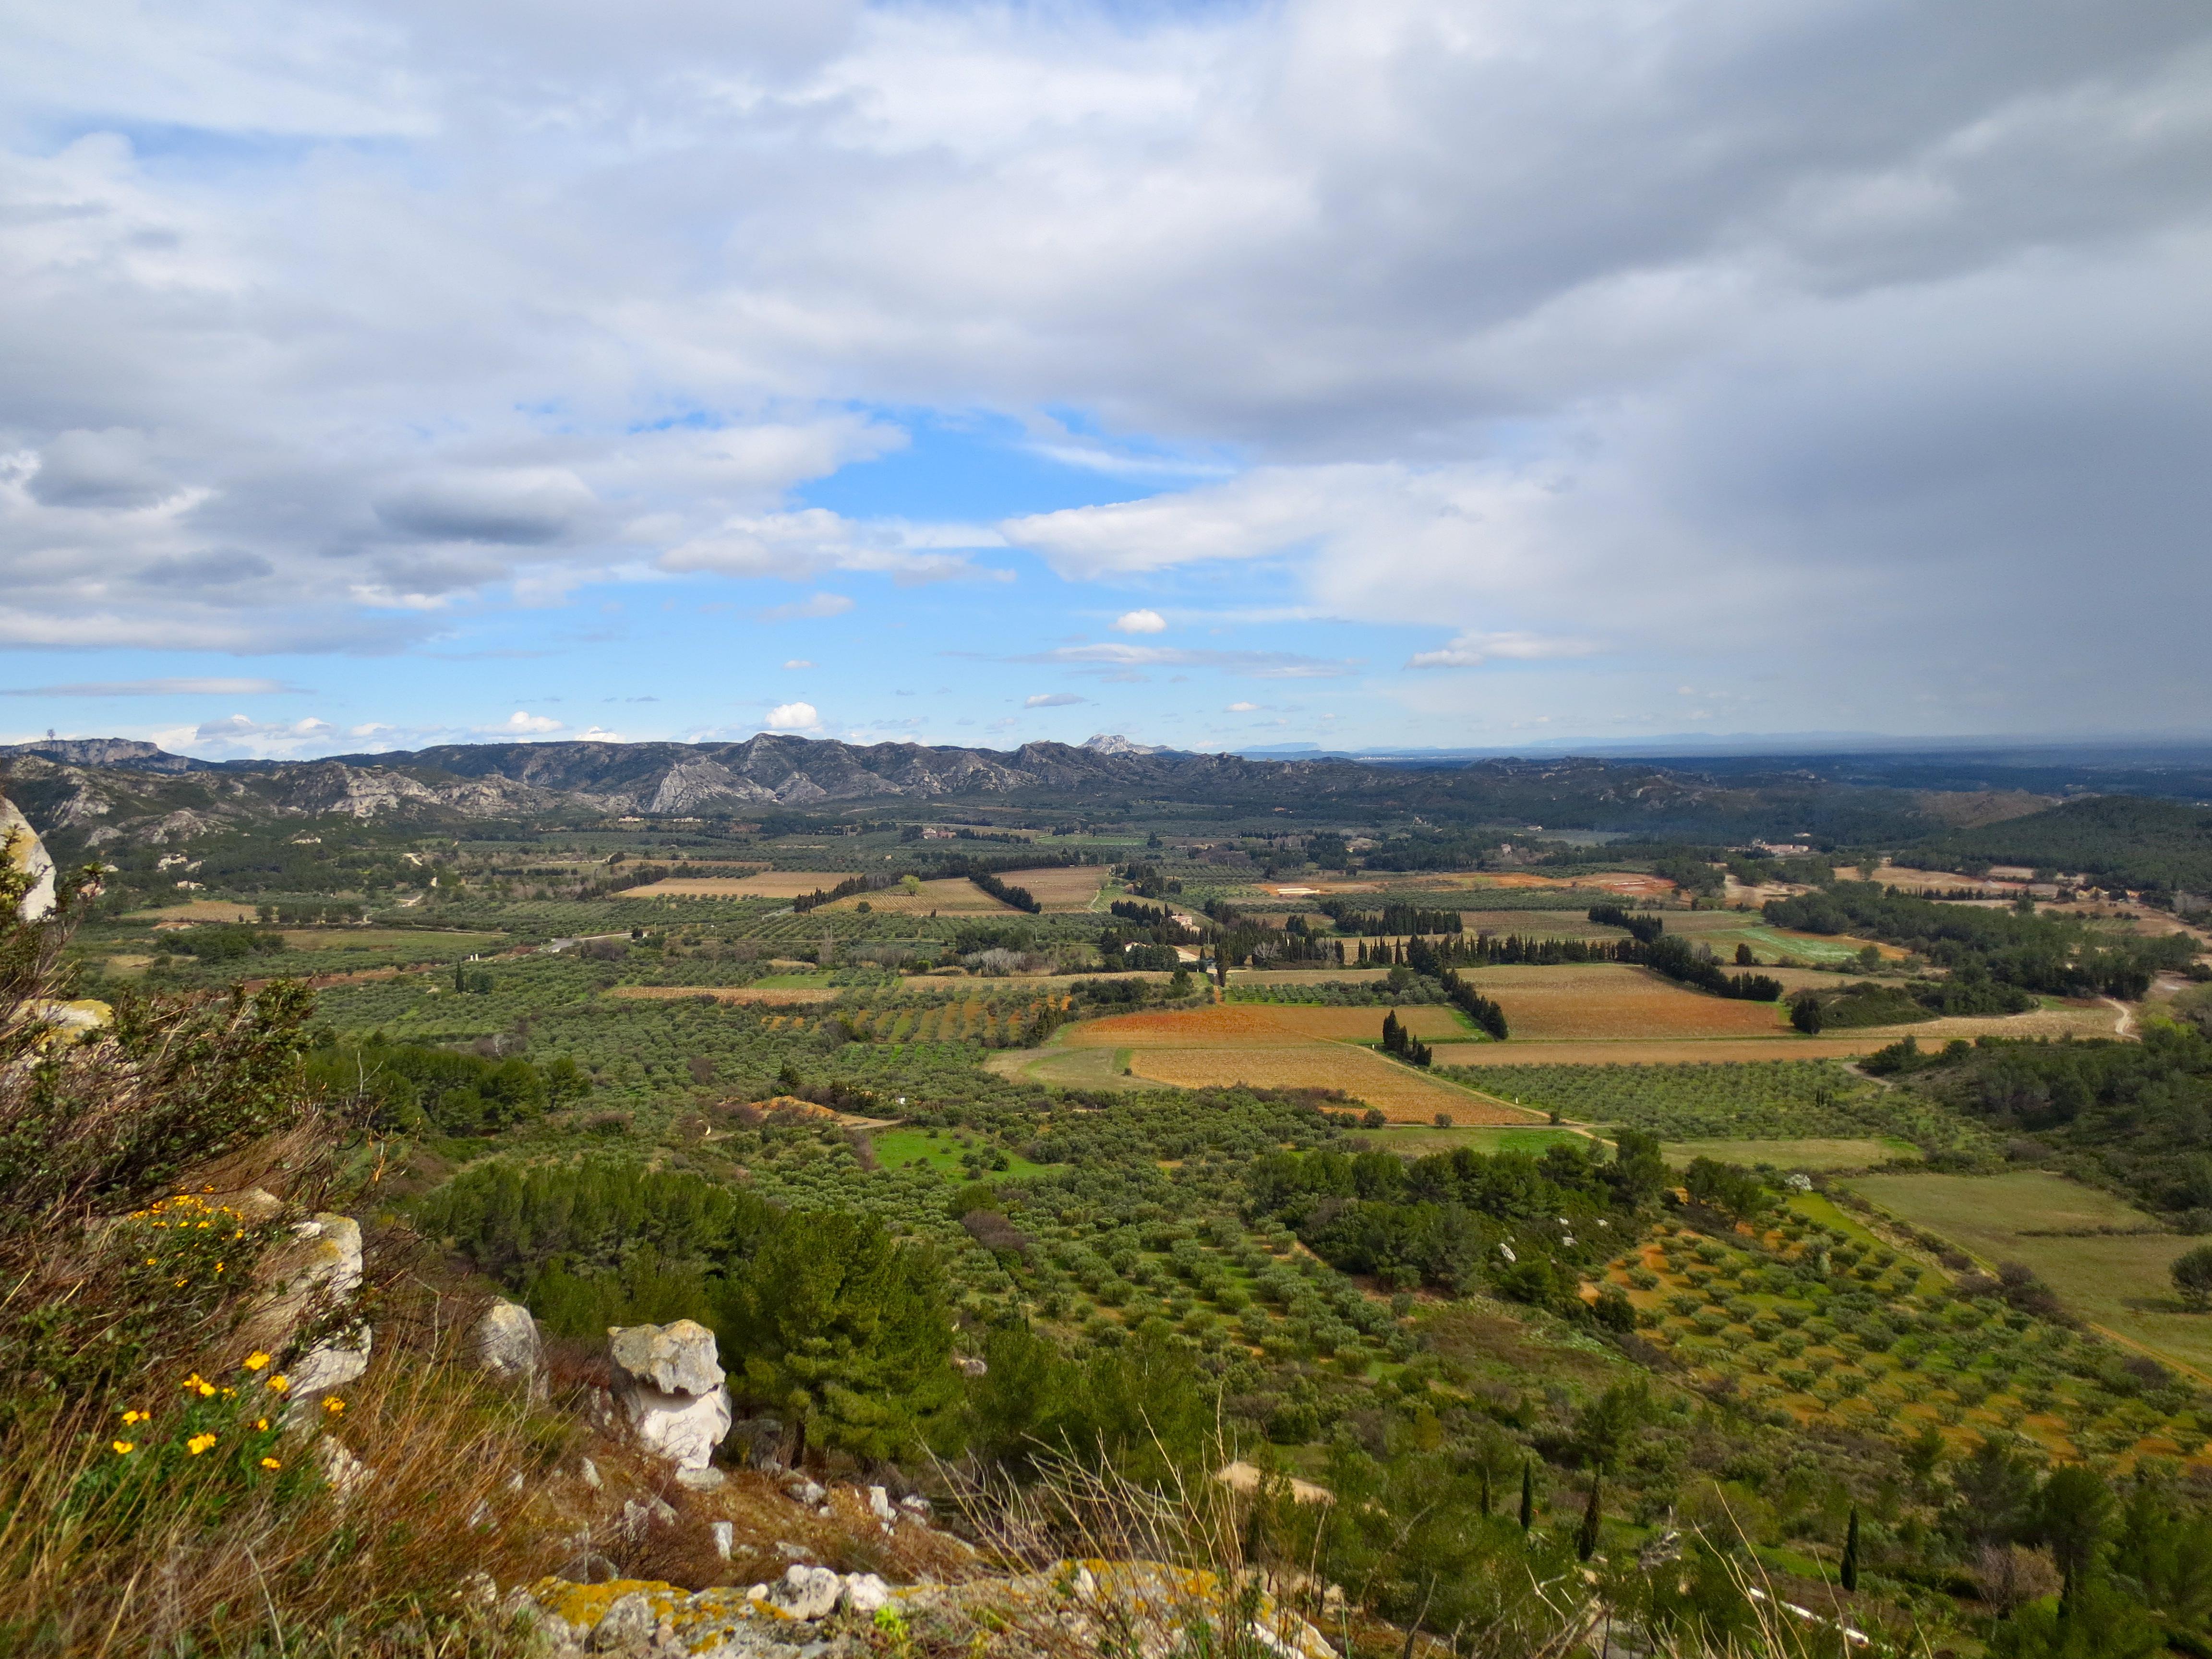 Lookout from Les Baux